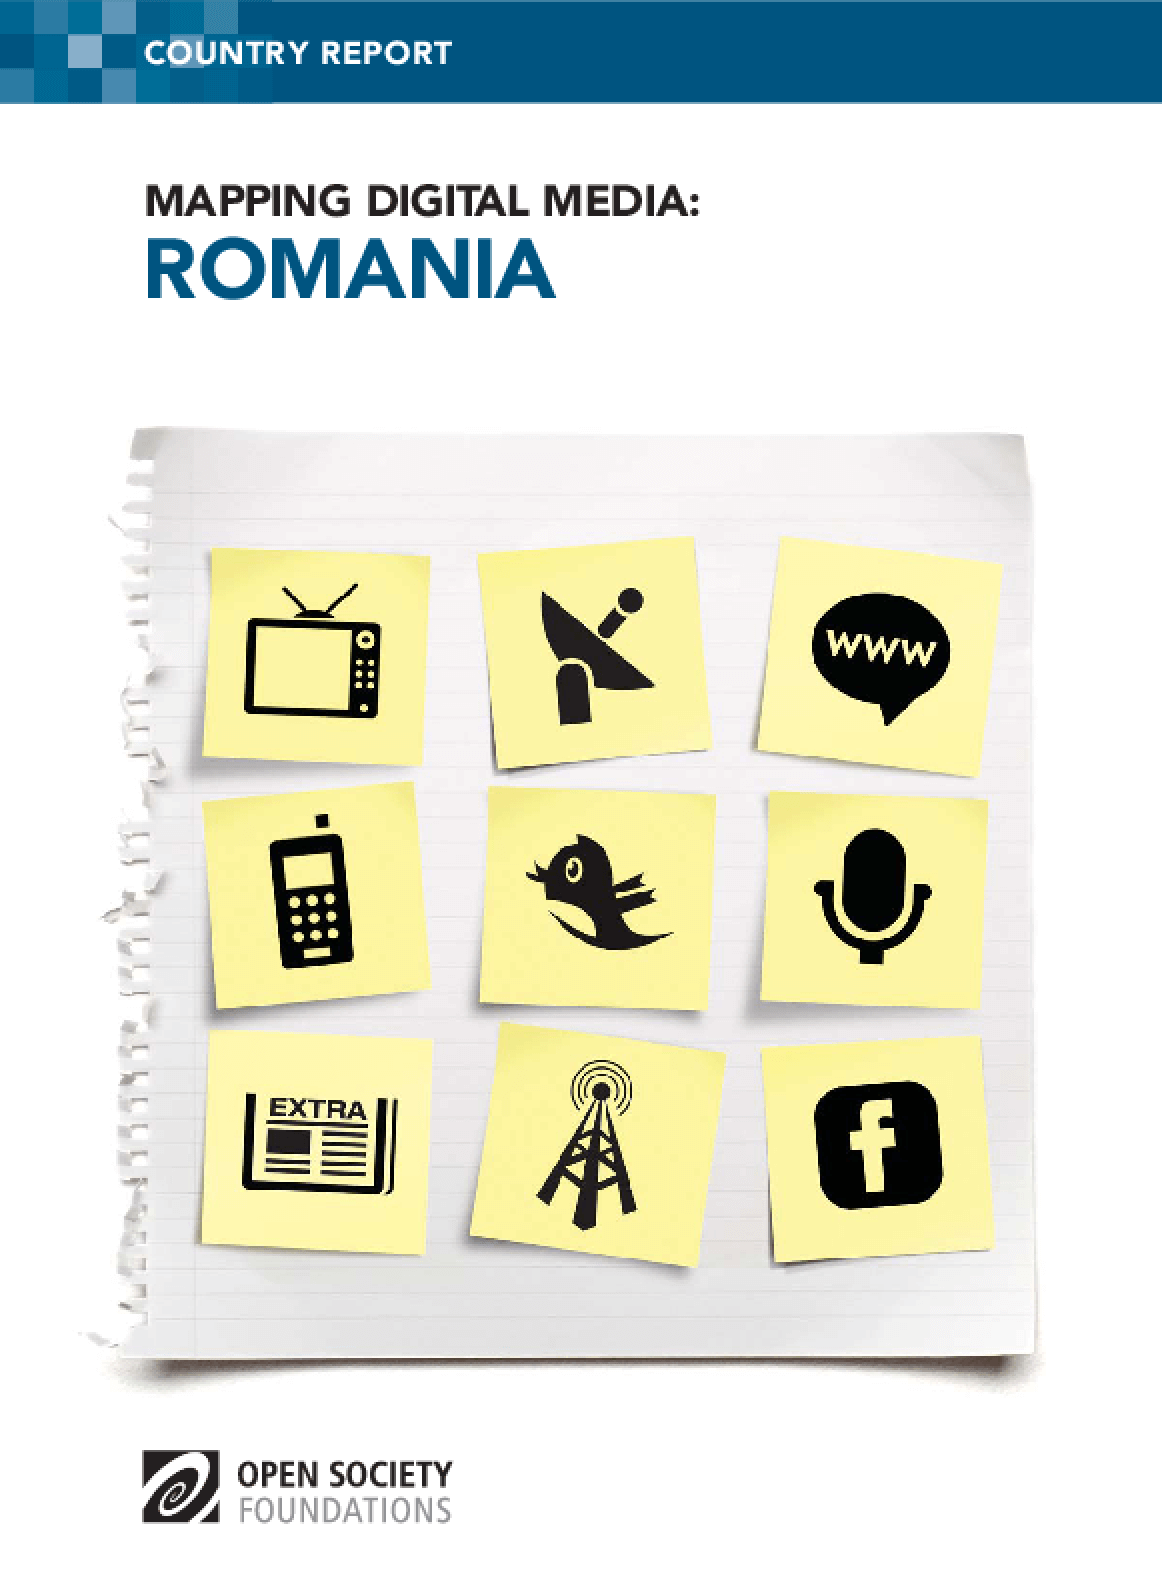 Mapping Digital Media: Romania